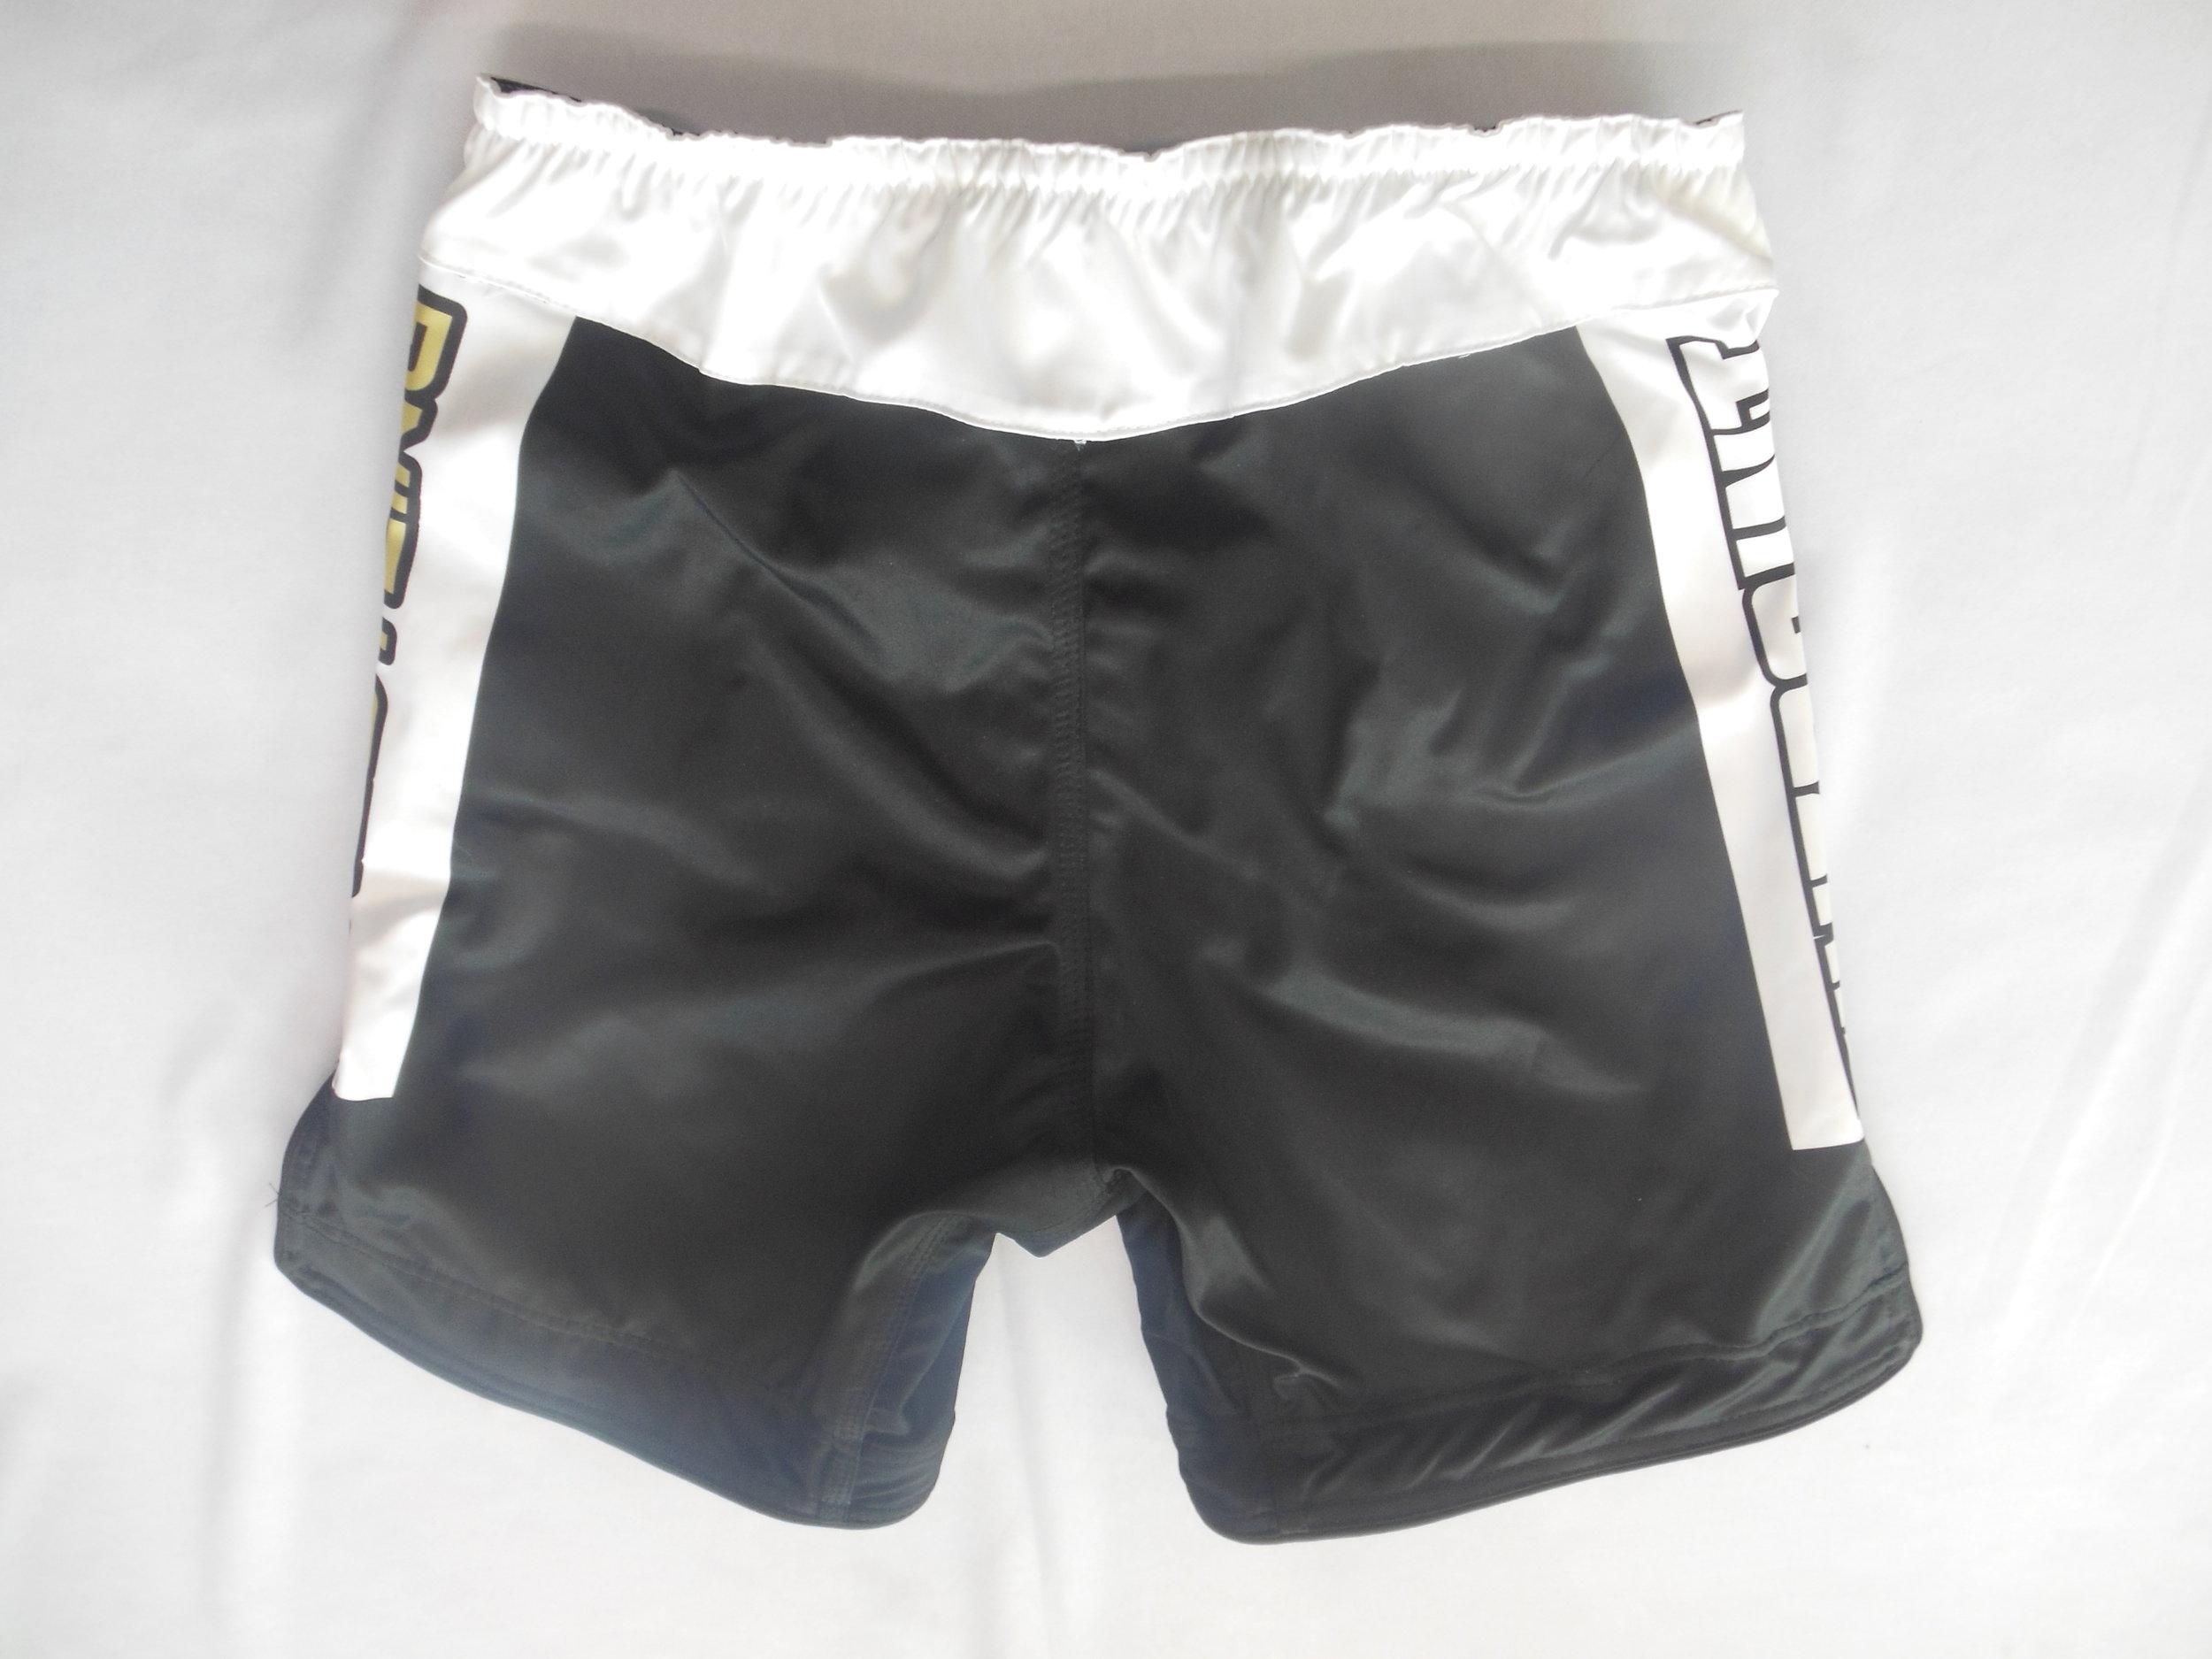 White and Black Baseball Uniforms, Shorts